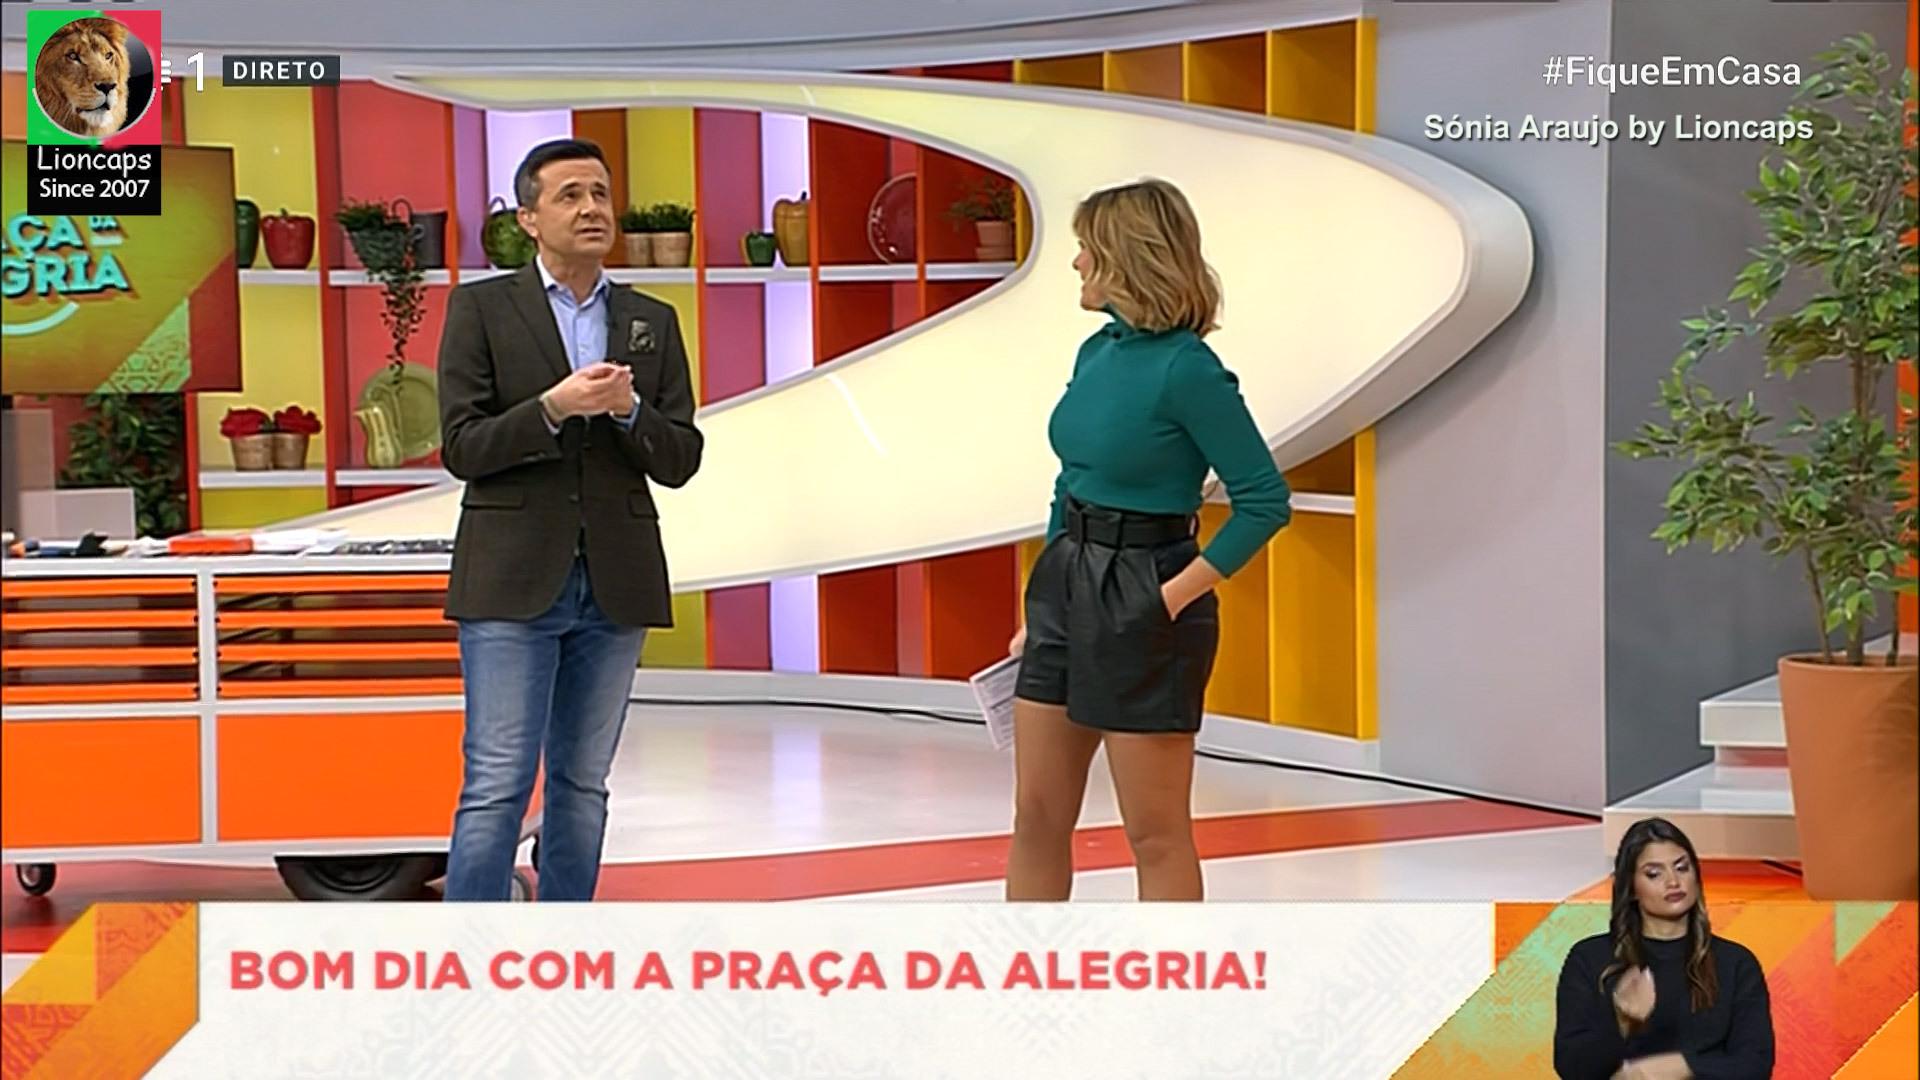 sonia_araujo_praca_lioncaps_27_03_2021_03 (7).jpg